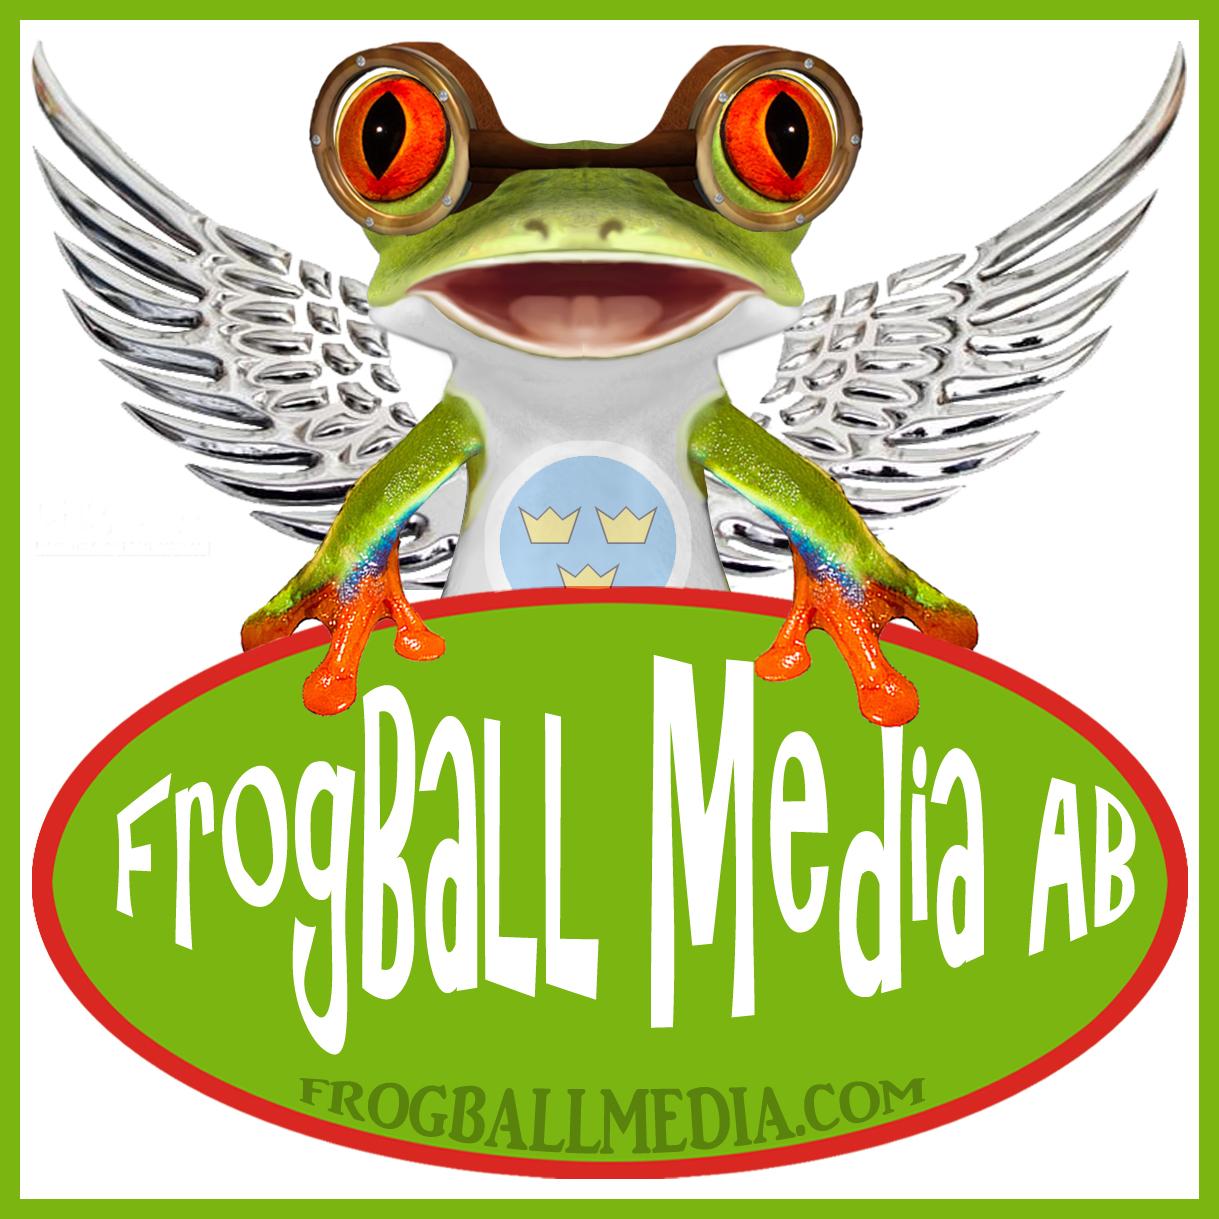 FrogBall Media AB